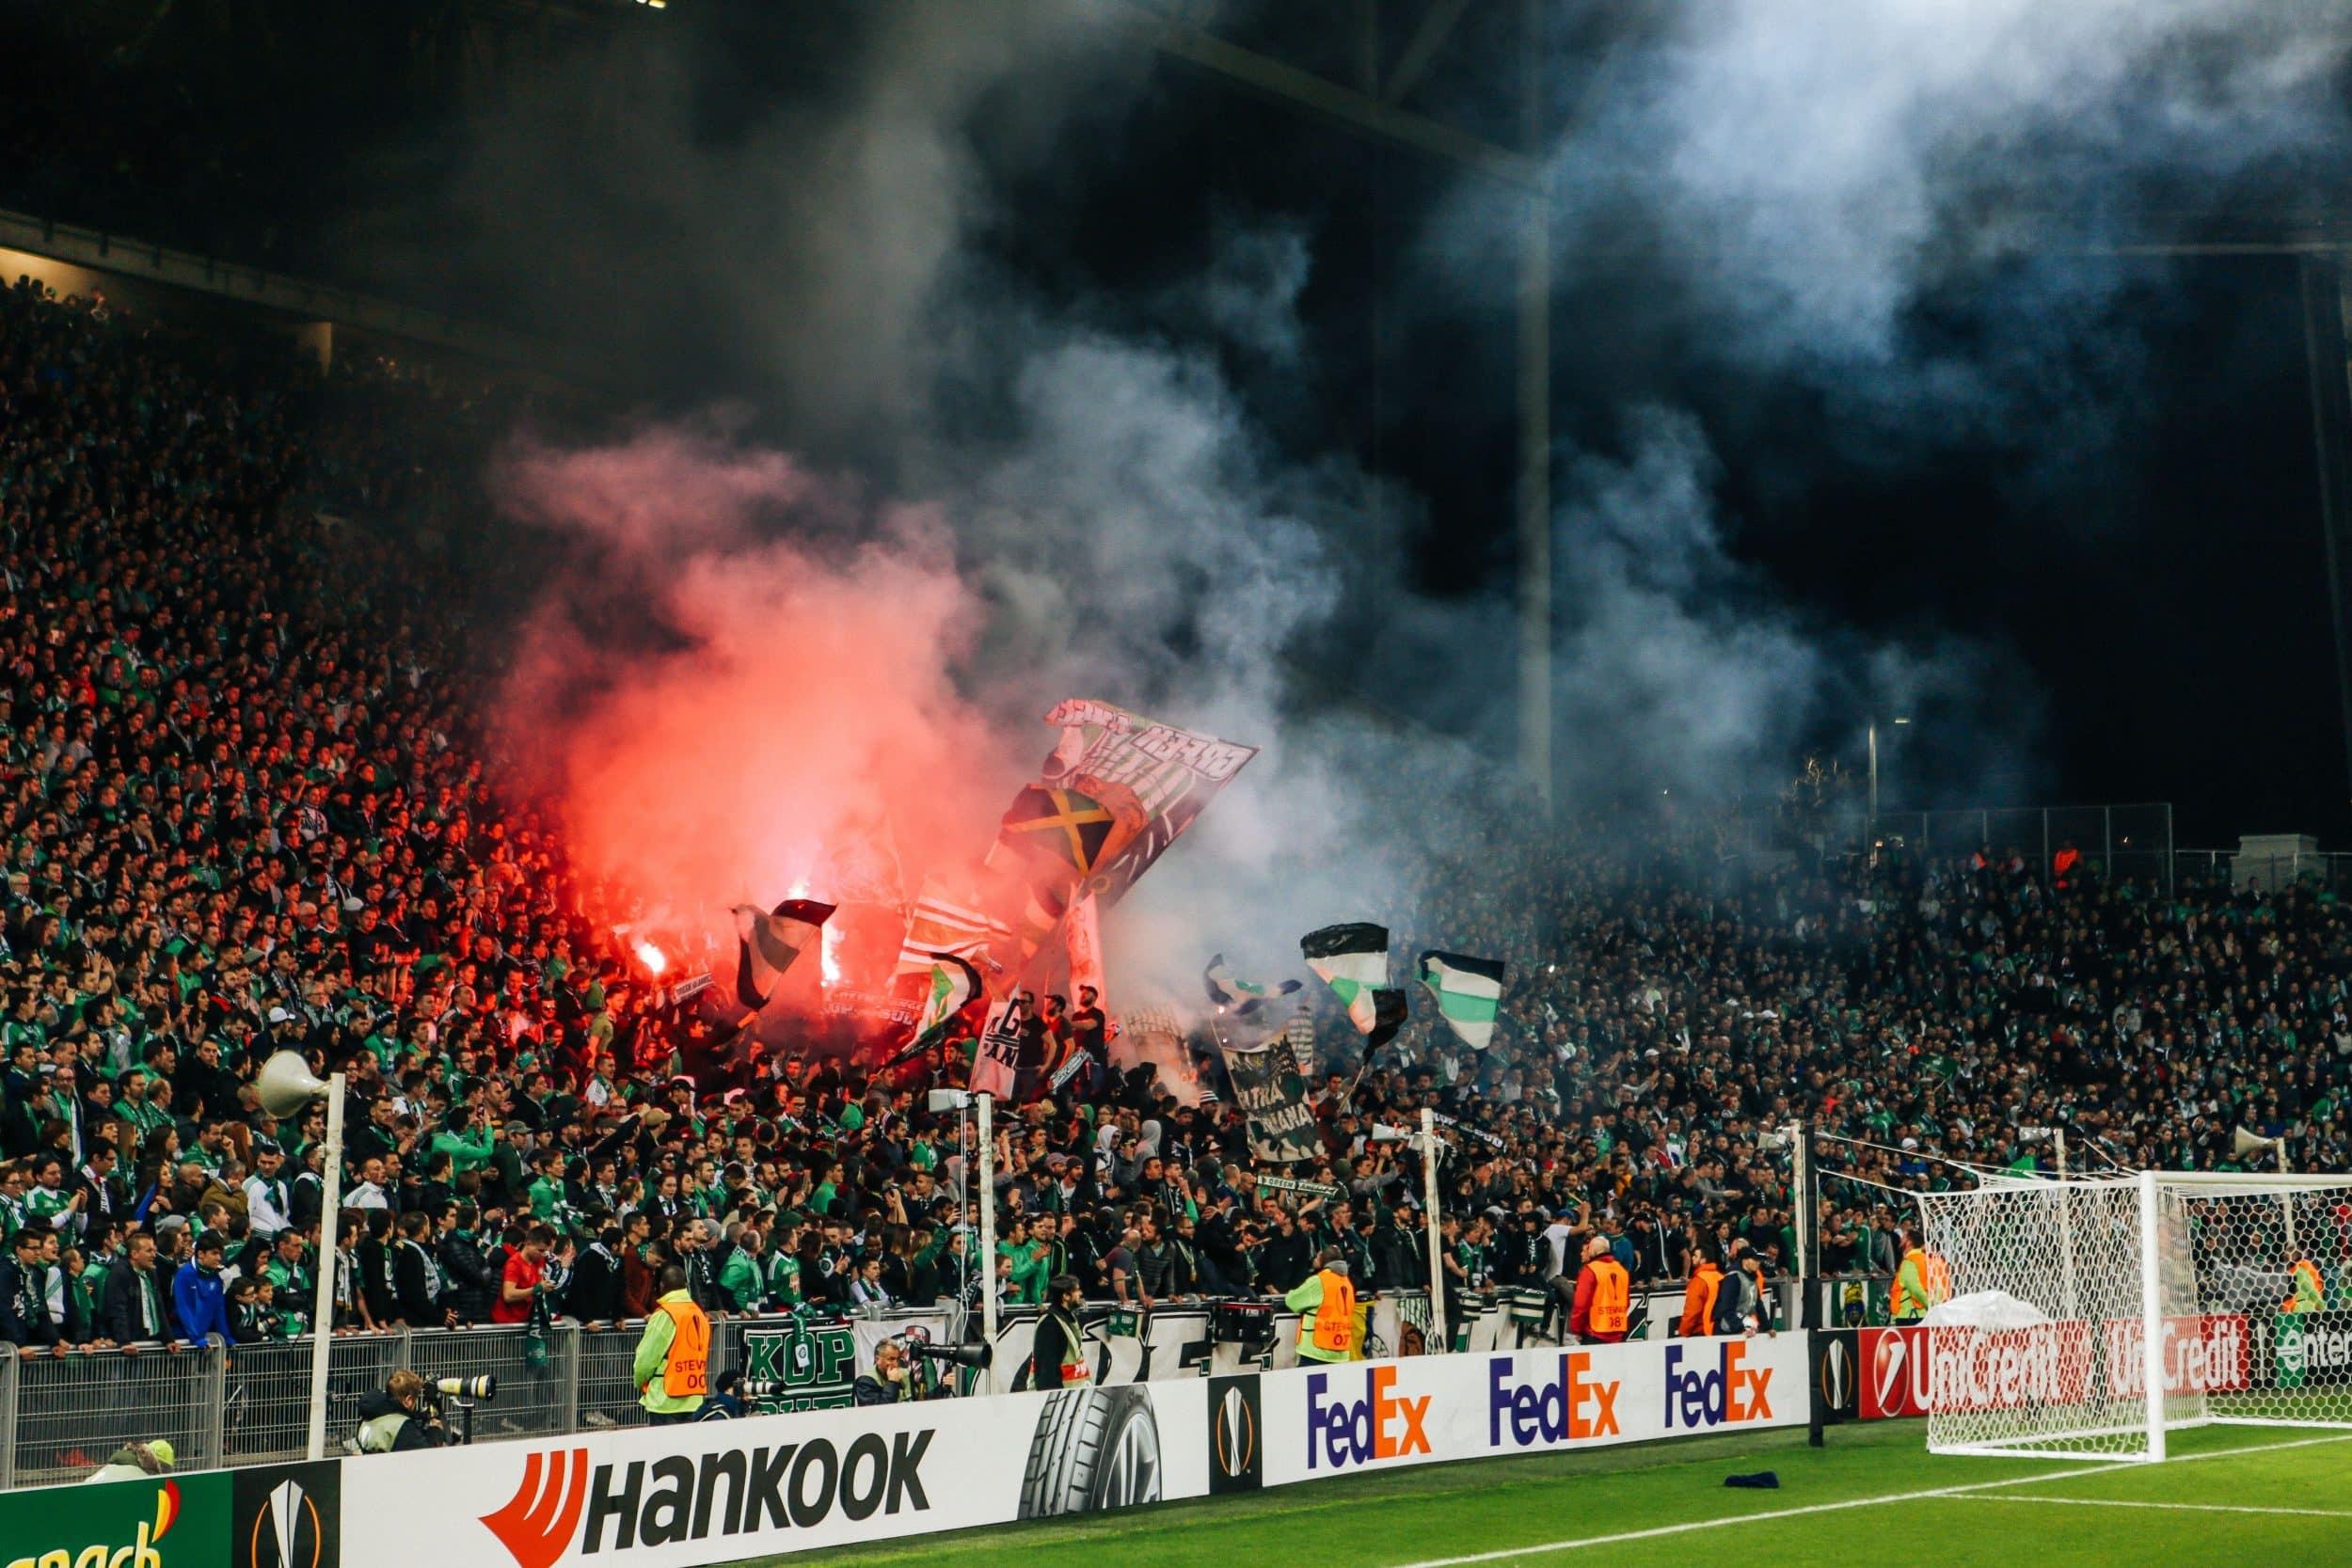 au-stade-geoffroy-guichard-asse-manchester-united-europa-league-2-min